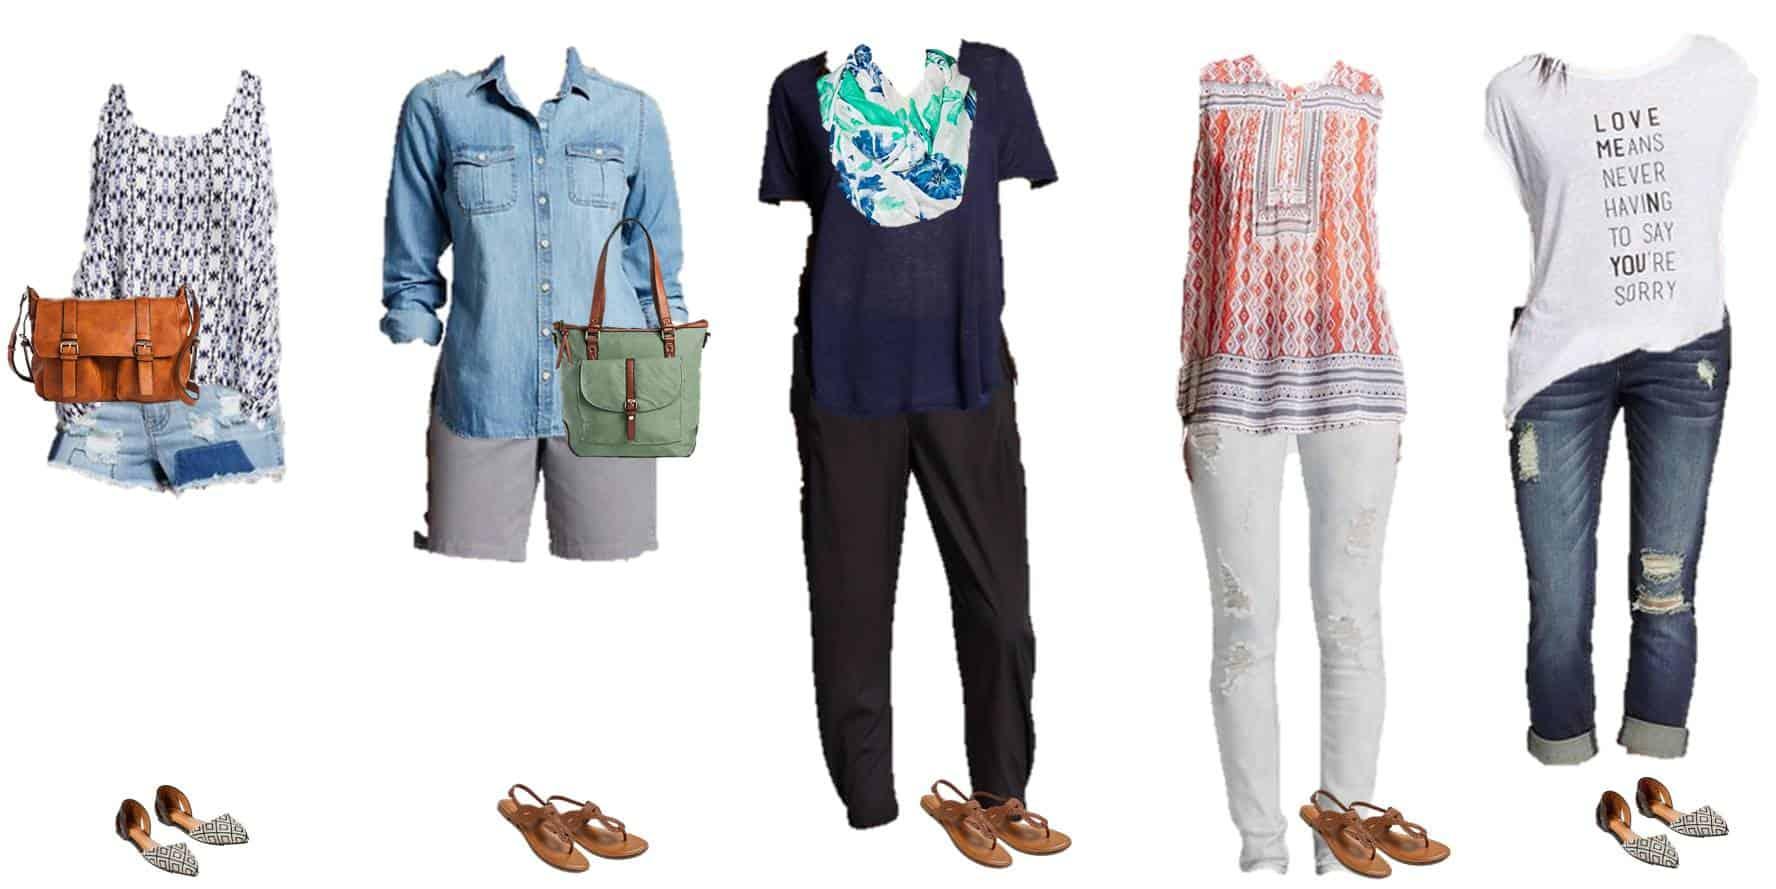 4.14 Mix & Match Fashion - Target Summer Styles 11-15